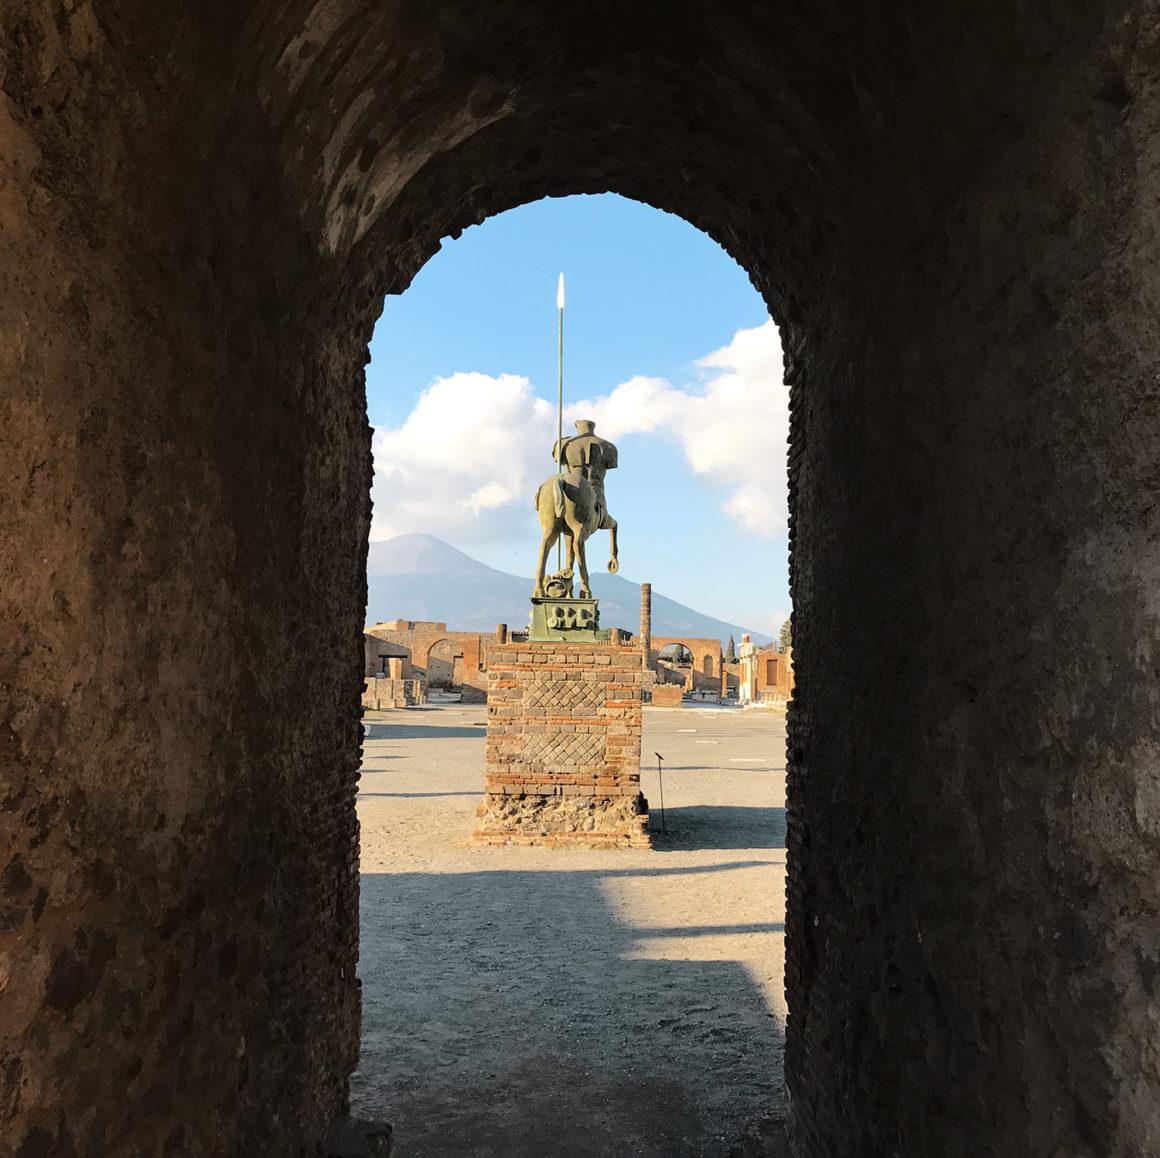 How to explore Naples in 3 days - including Pompeii and Mount Vesuvius